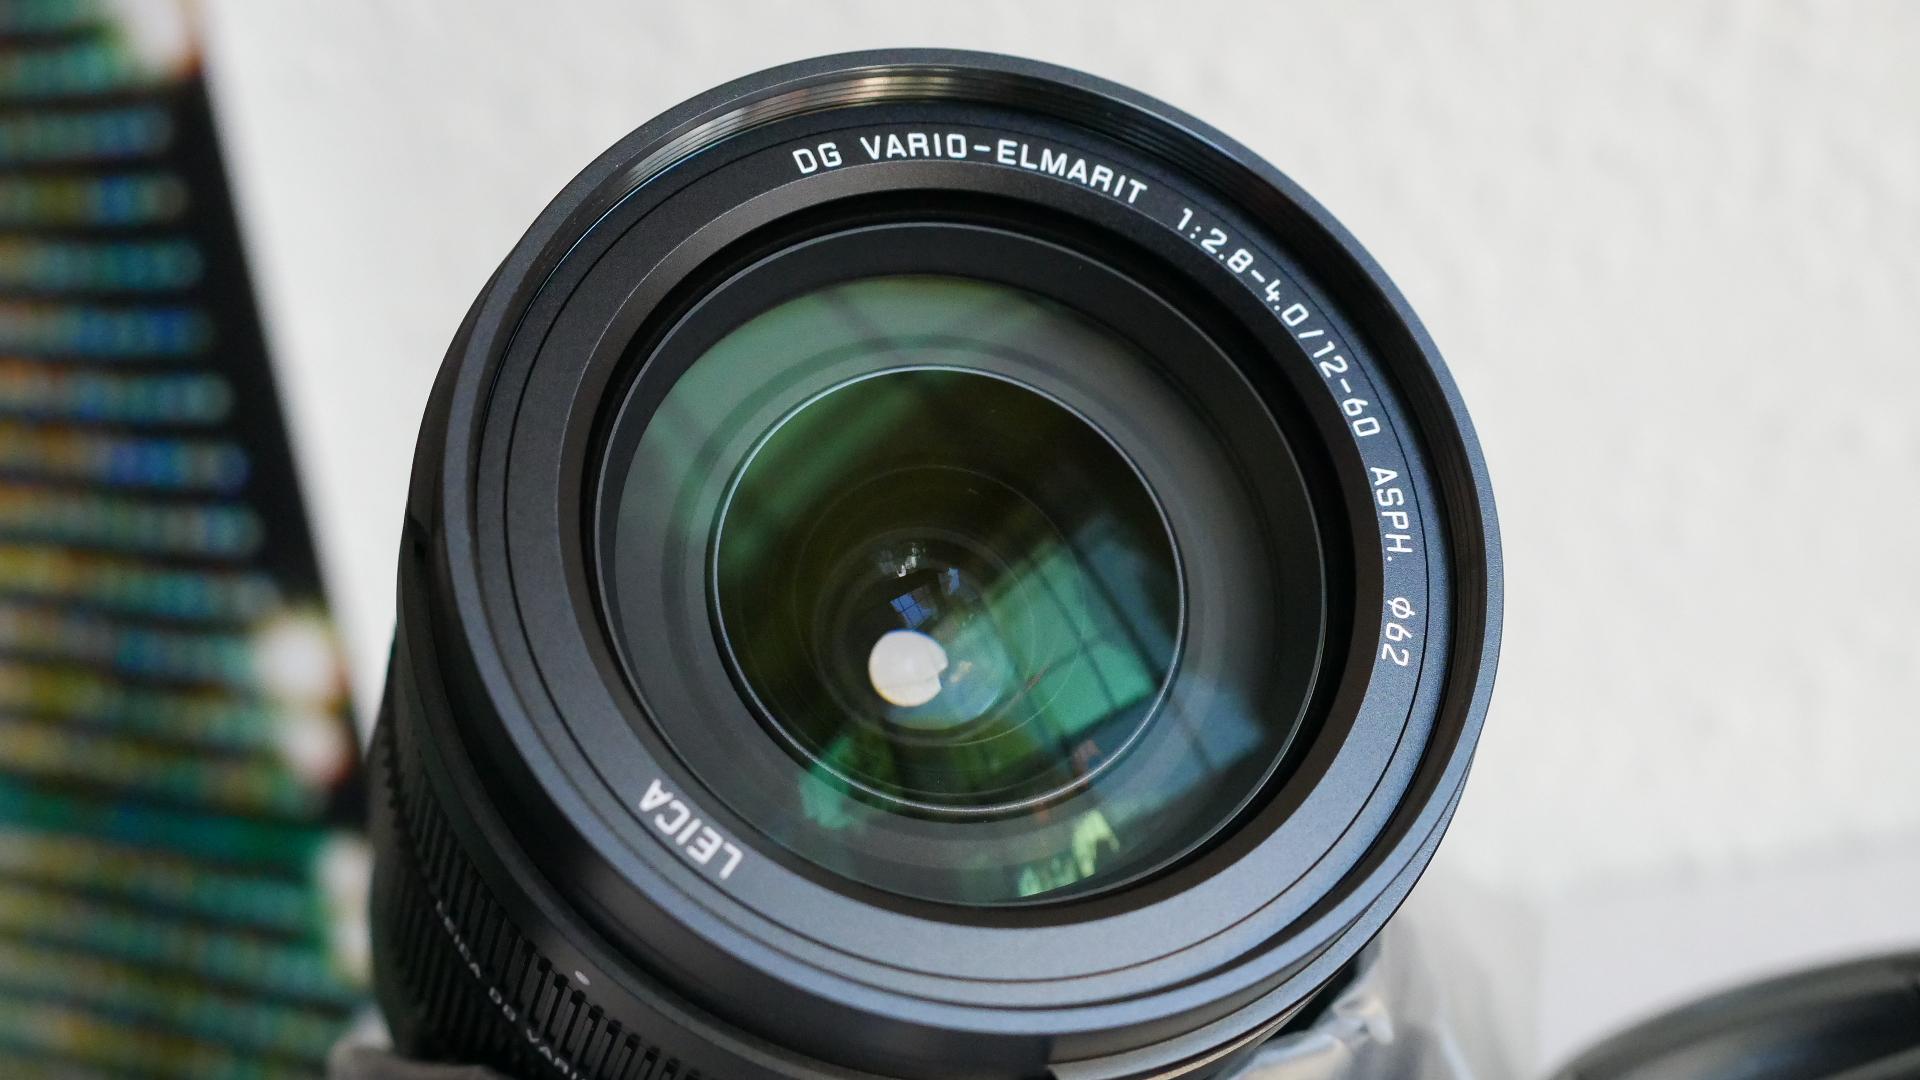 Panasonic Leica Dg Vario Elmarit 12 60mm F 28 40 Asph Power Ois Macro 45mm Lens Hood New Filter Kit Bundle